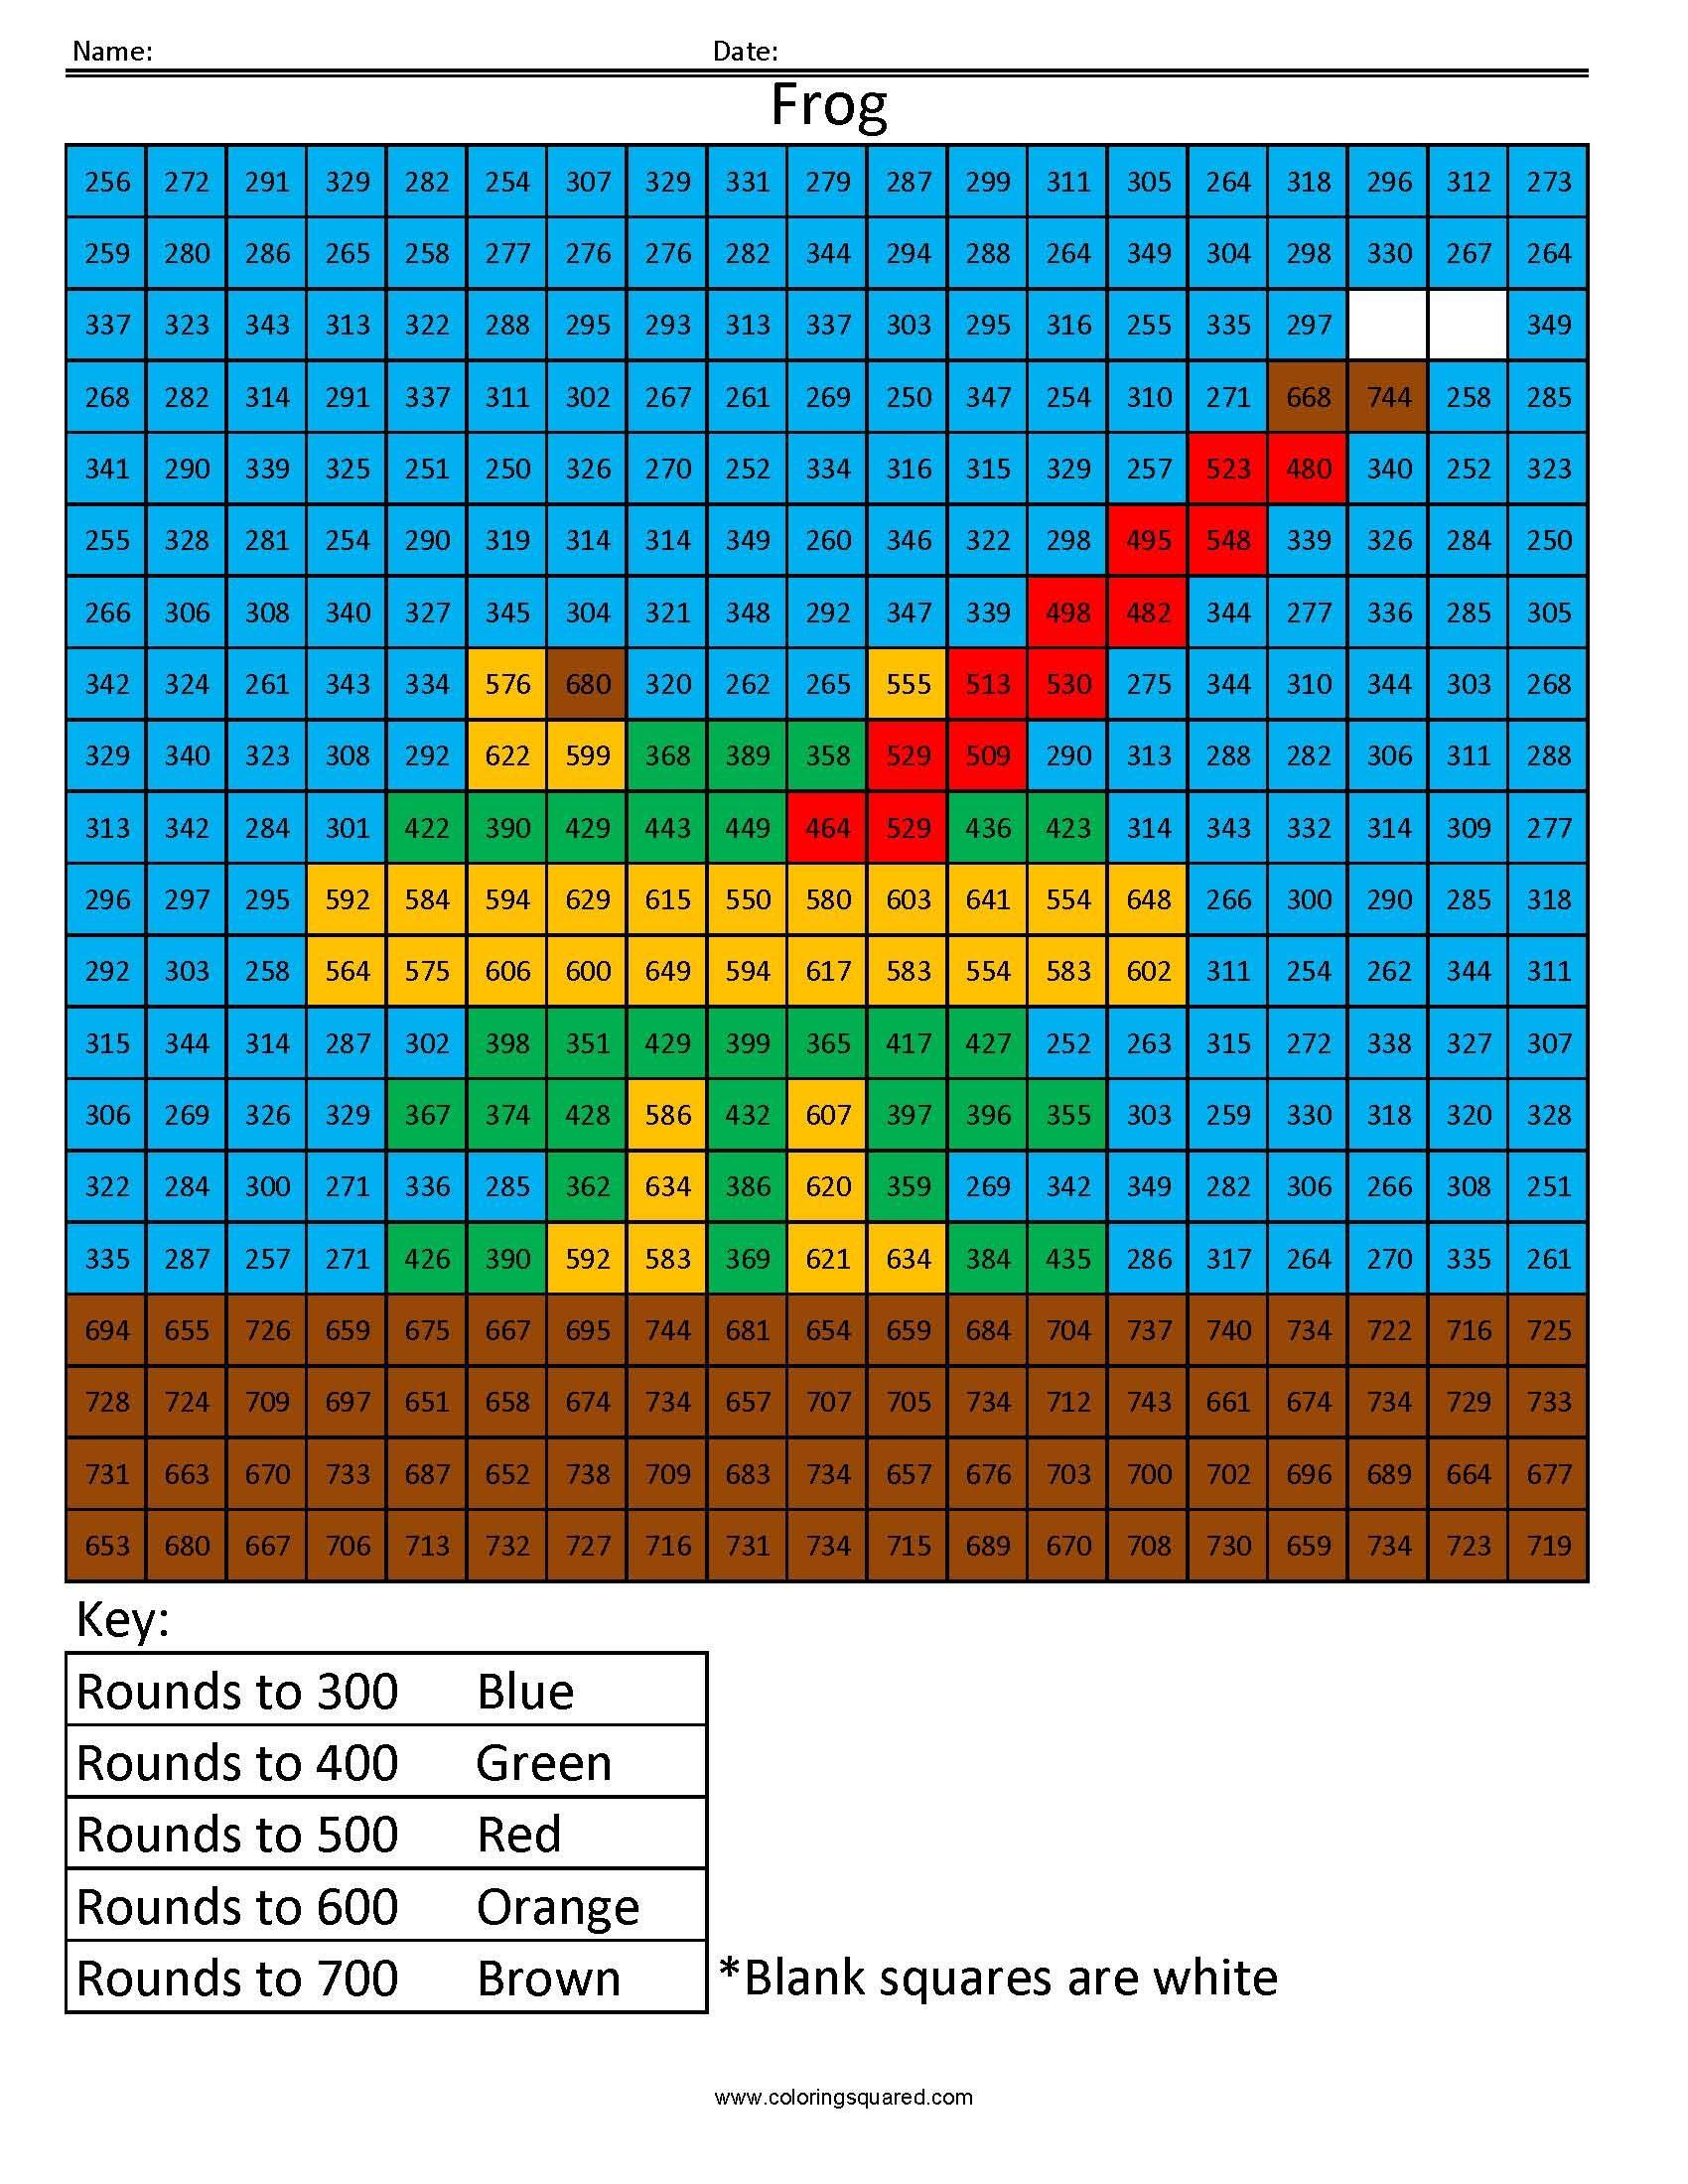 Starfish Rounding Tens Place Coloring Squared Free Math Worksheets Rounding Decimals Worksheet Decimals Worksheets [ 2200 x 1700 Pixel ]